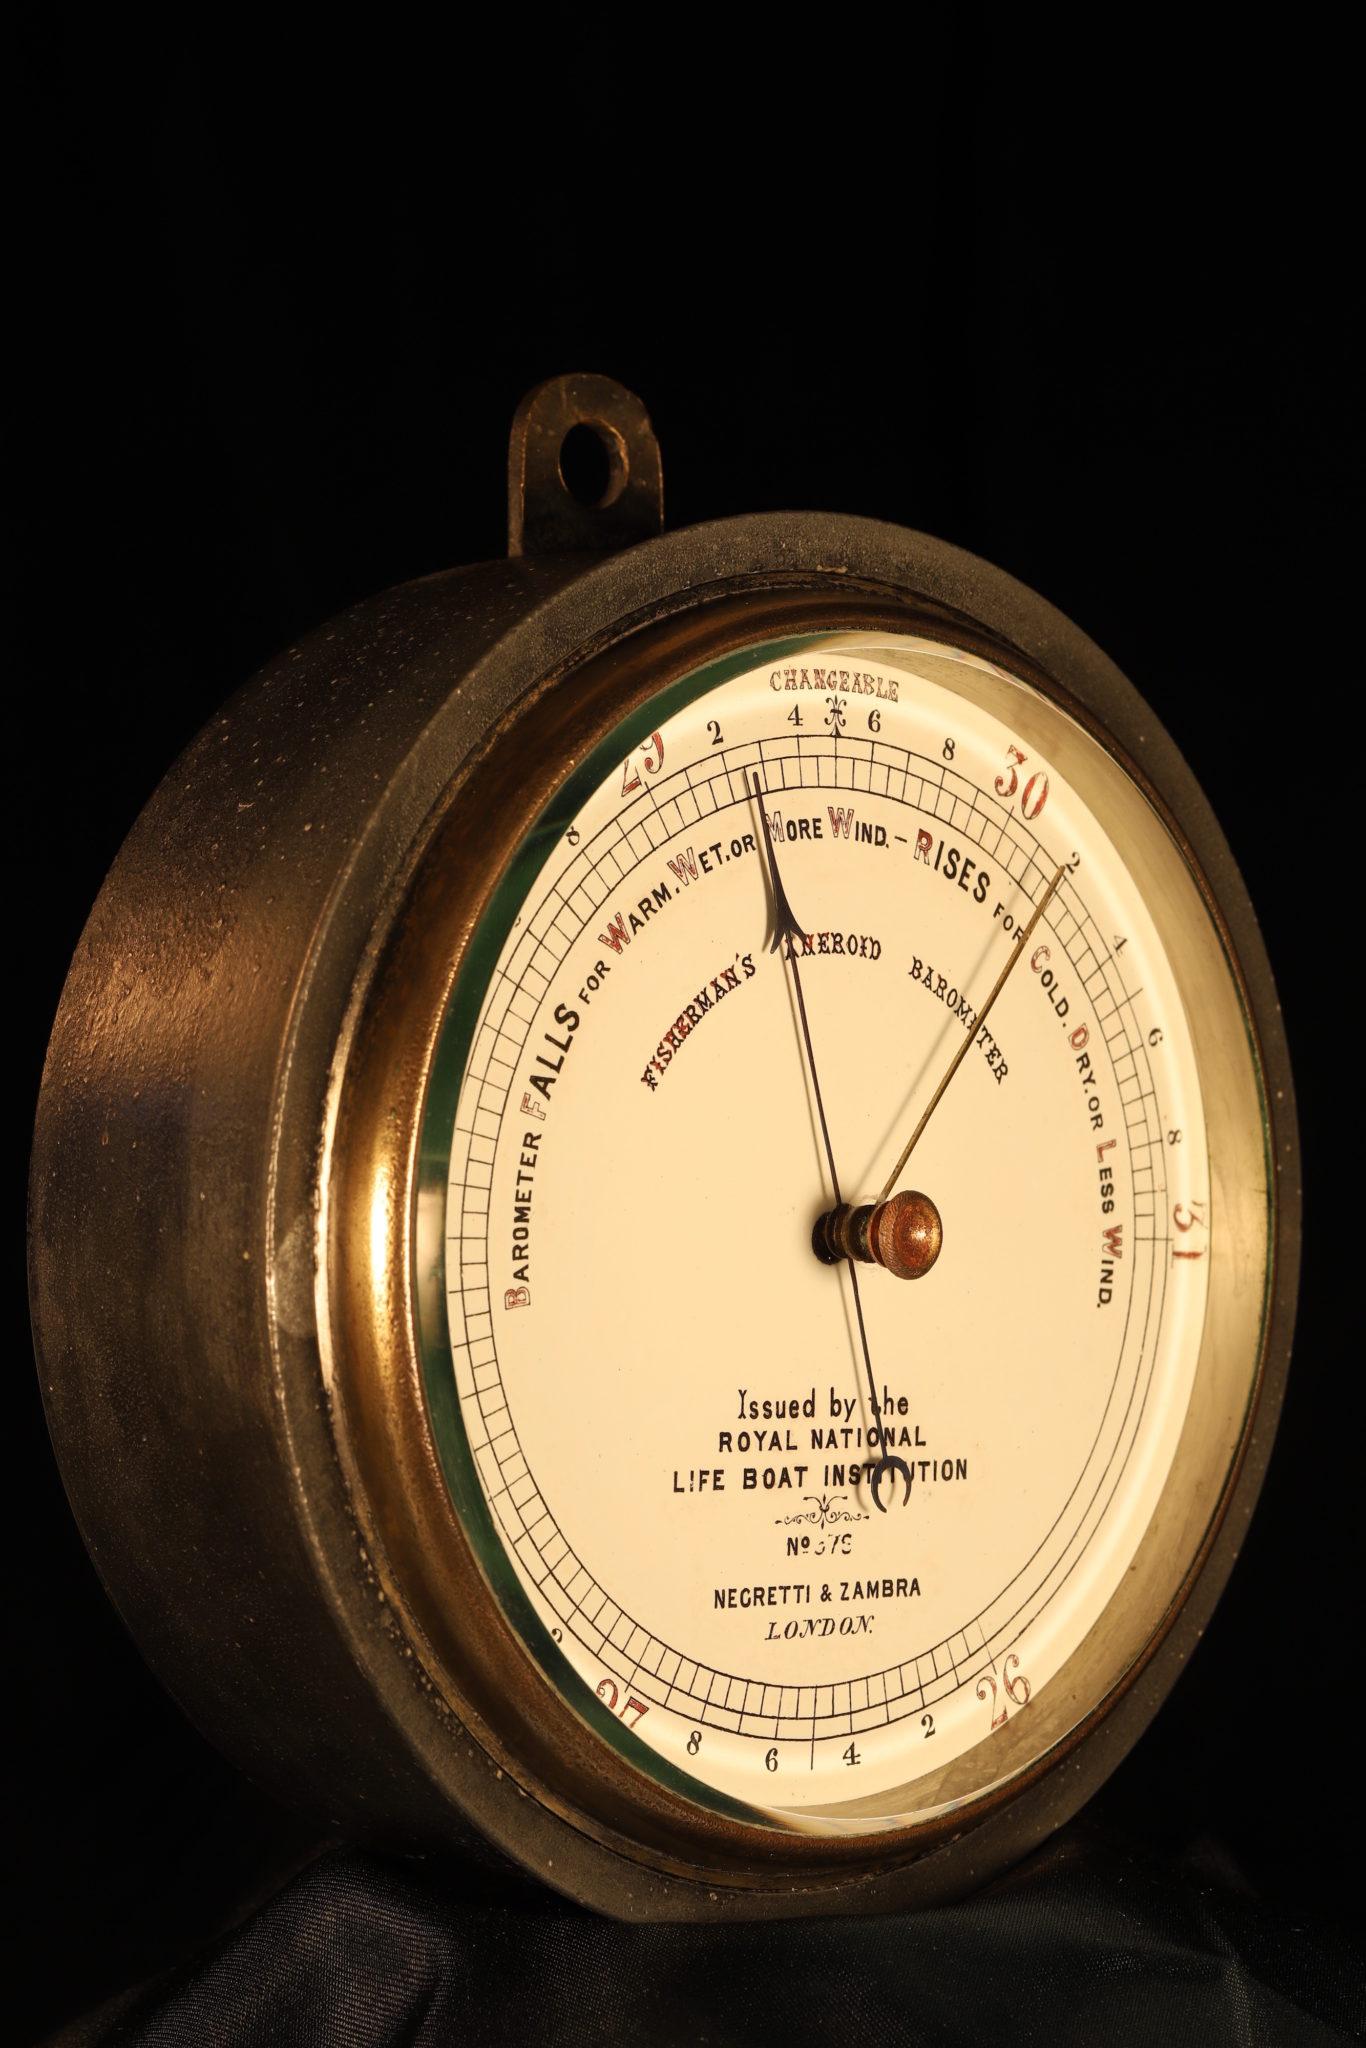 Image of Negretti & Zambra RNLI Barometer No 378 c1875